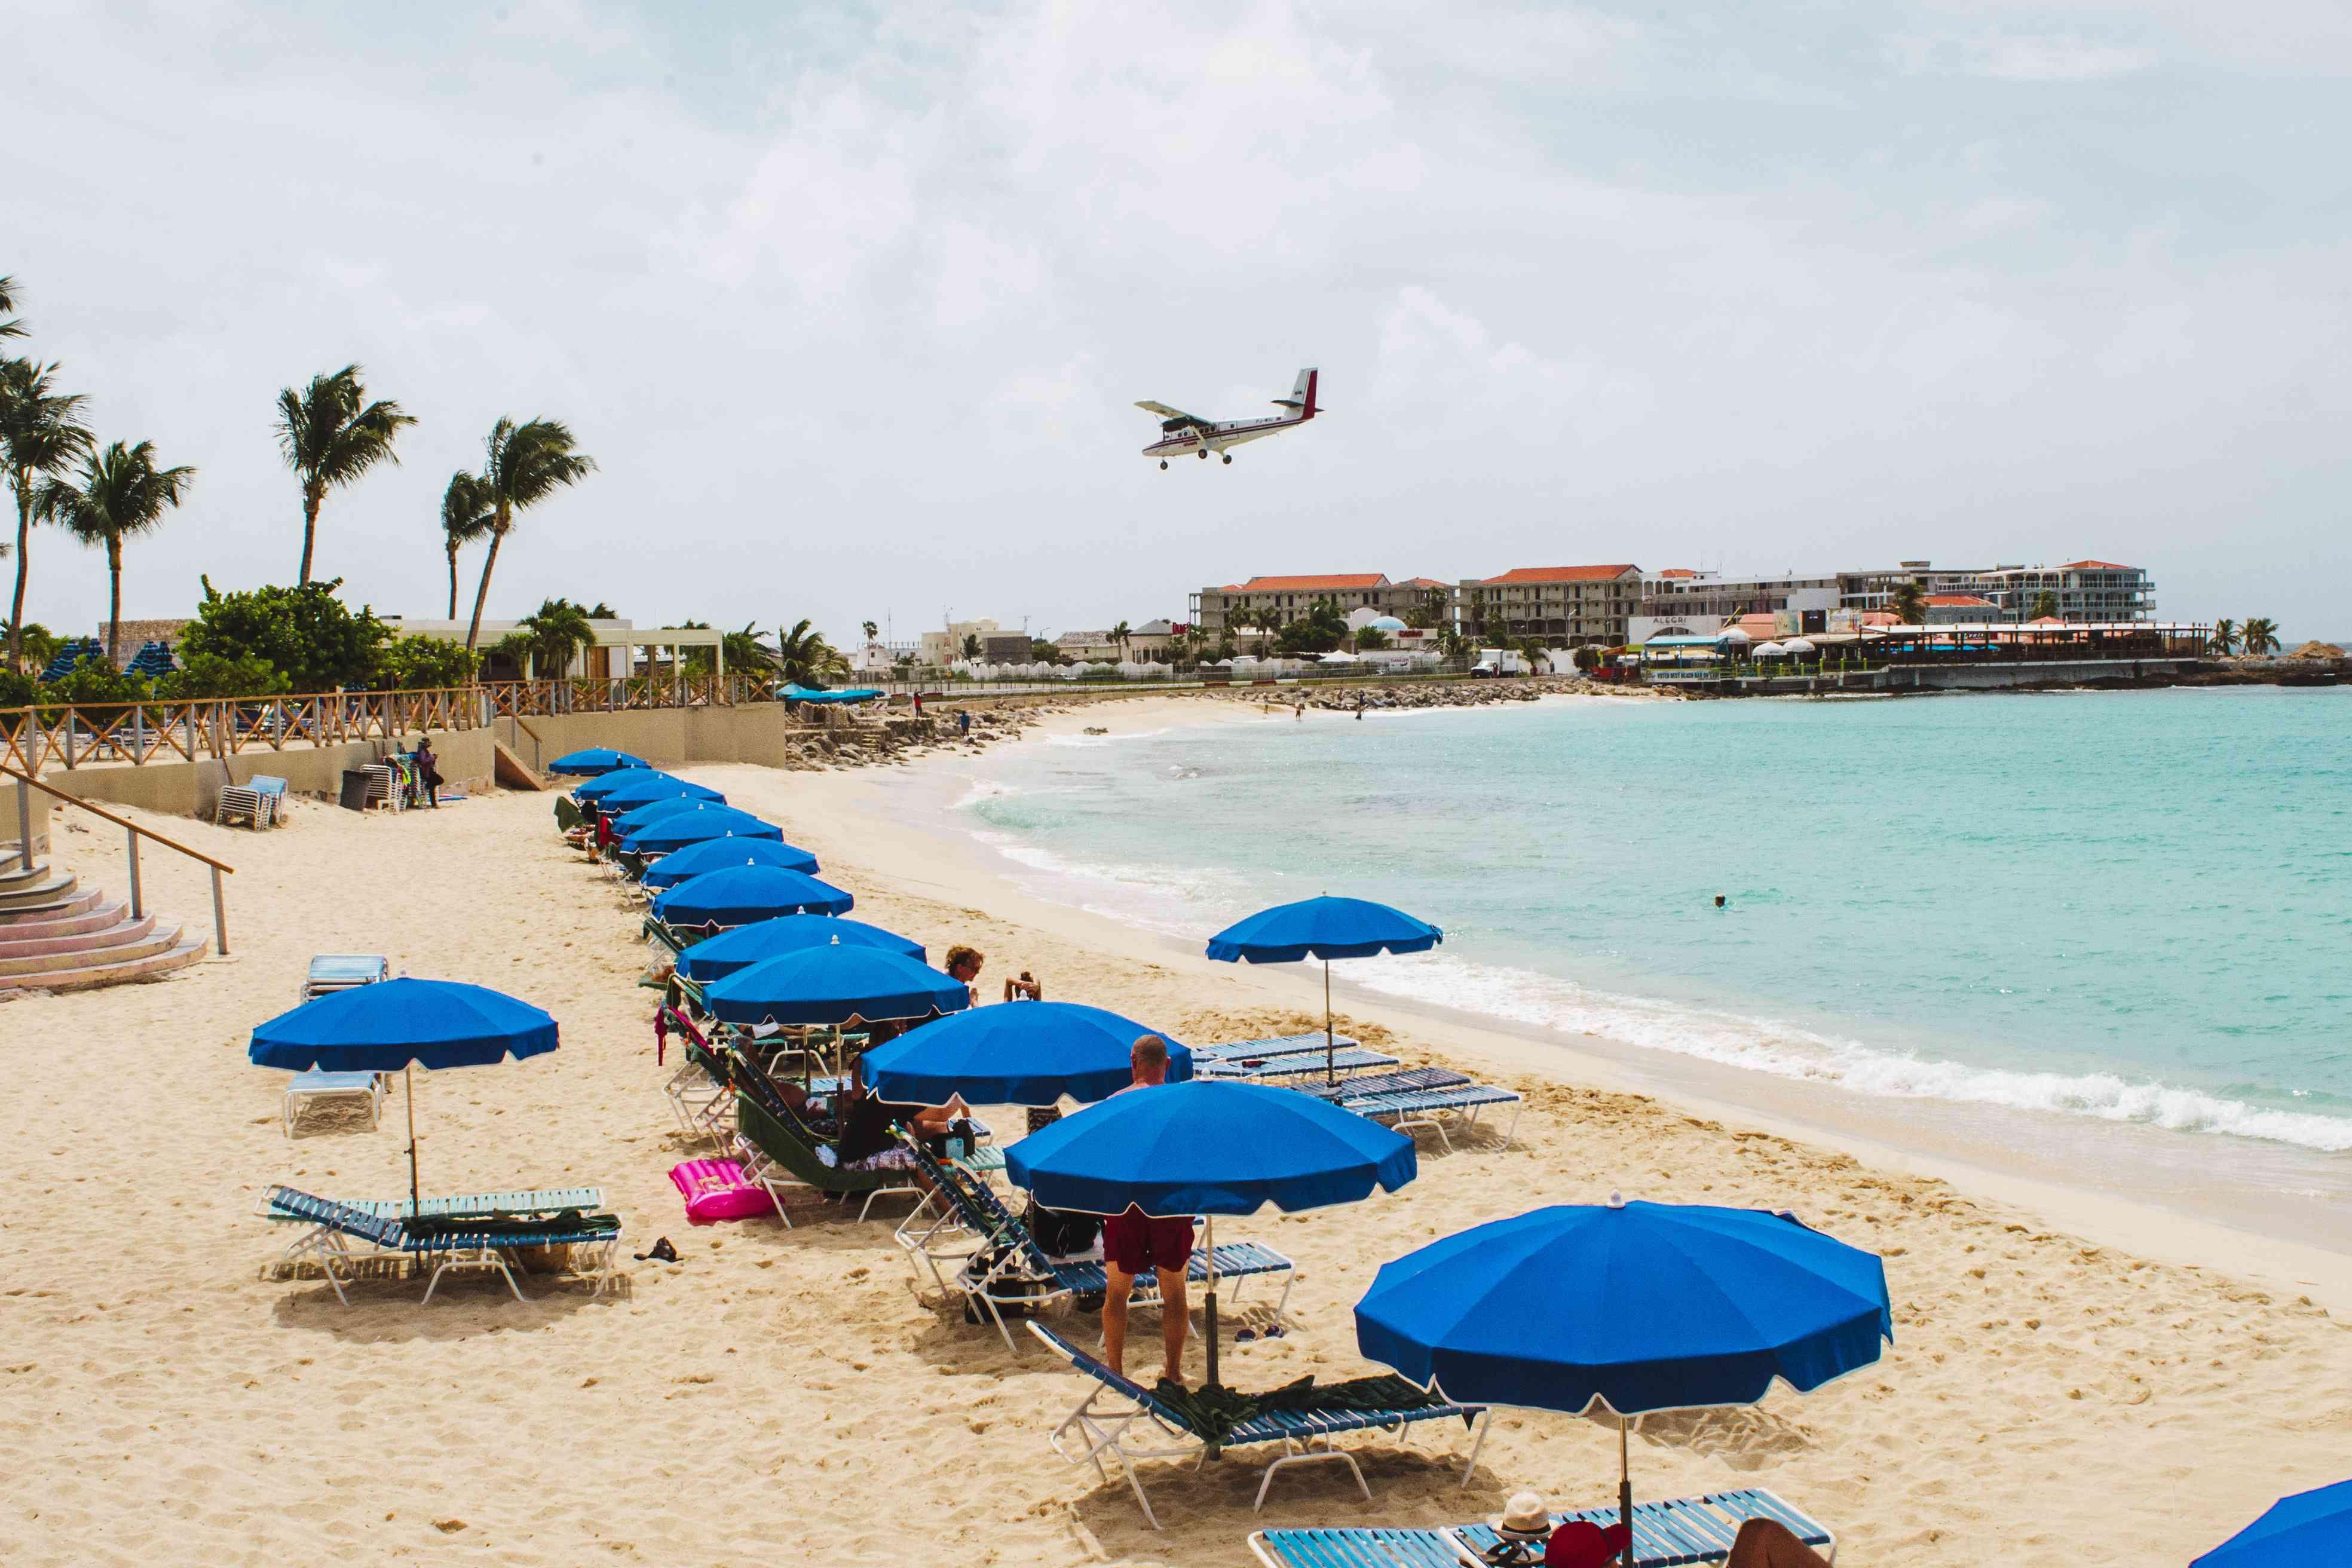 Plane landing at Maho Bay in St Maarten